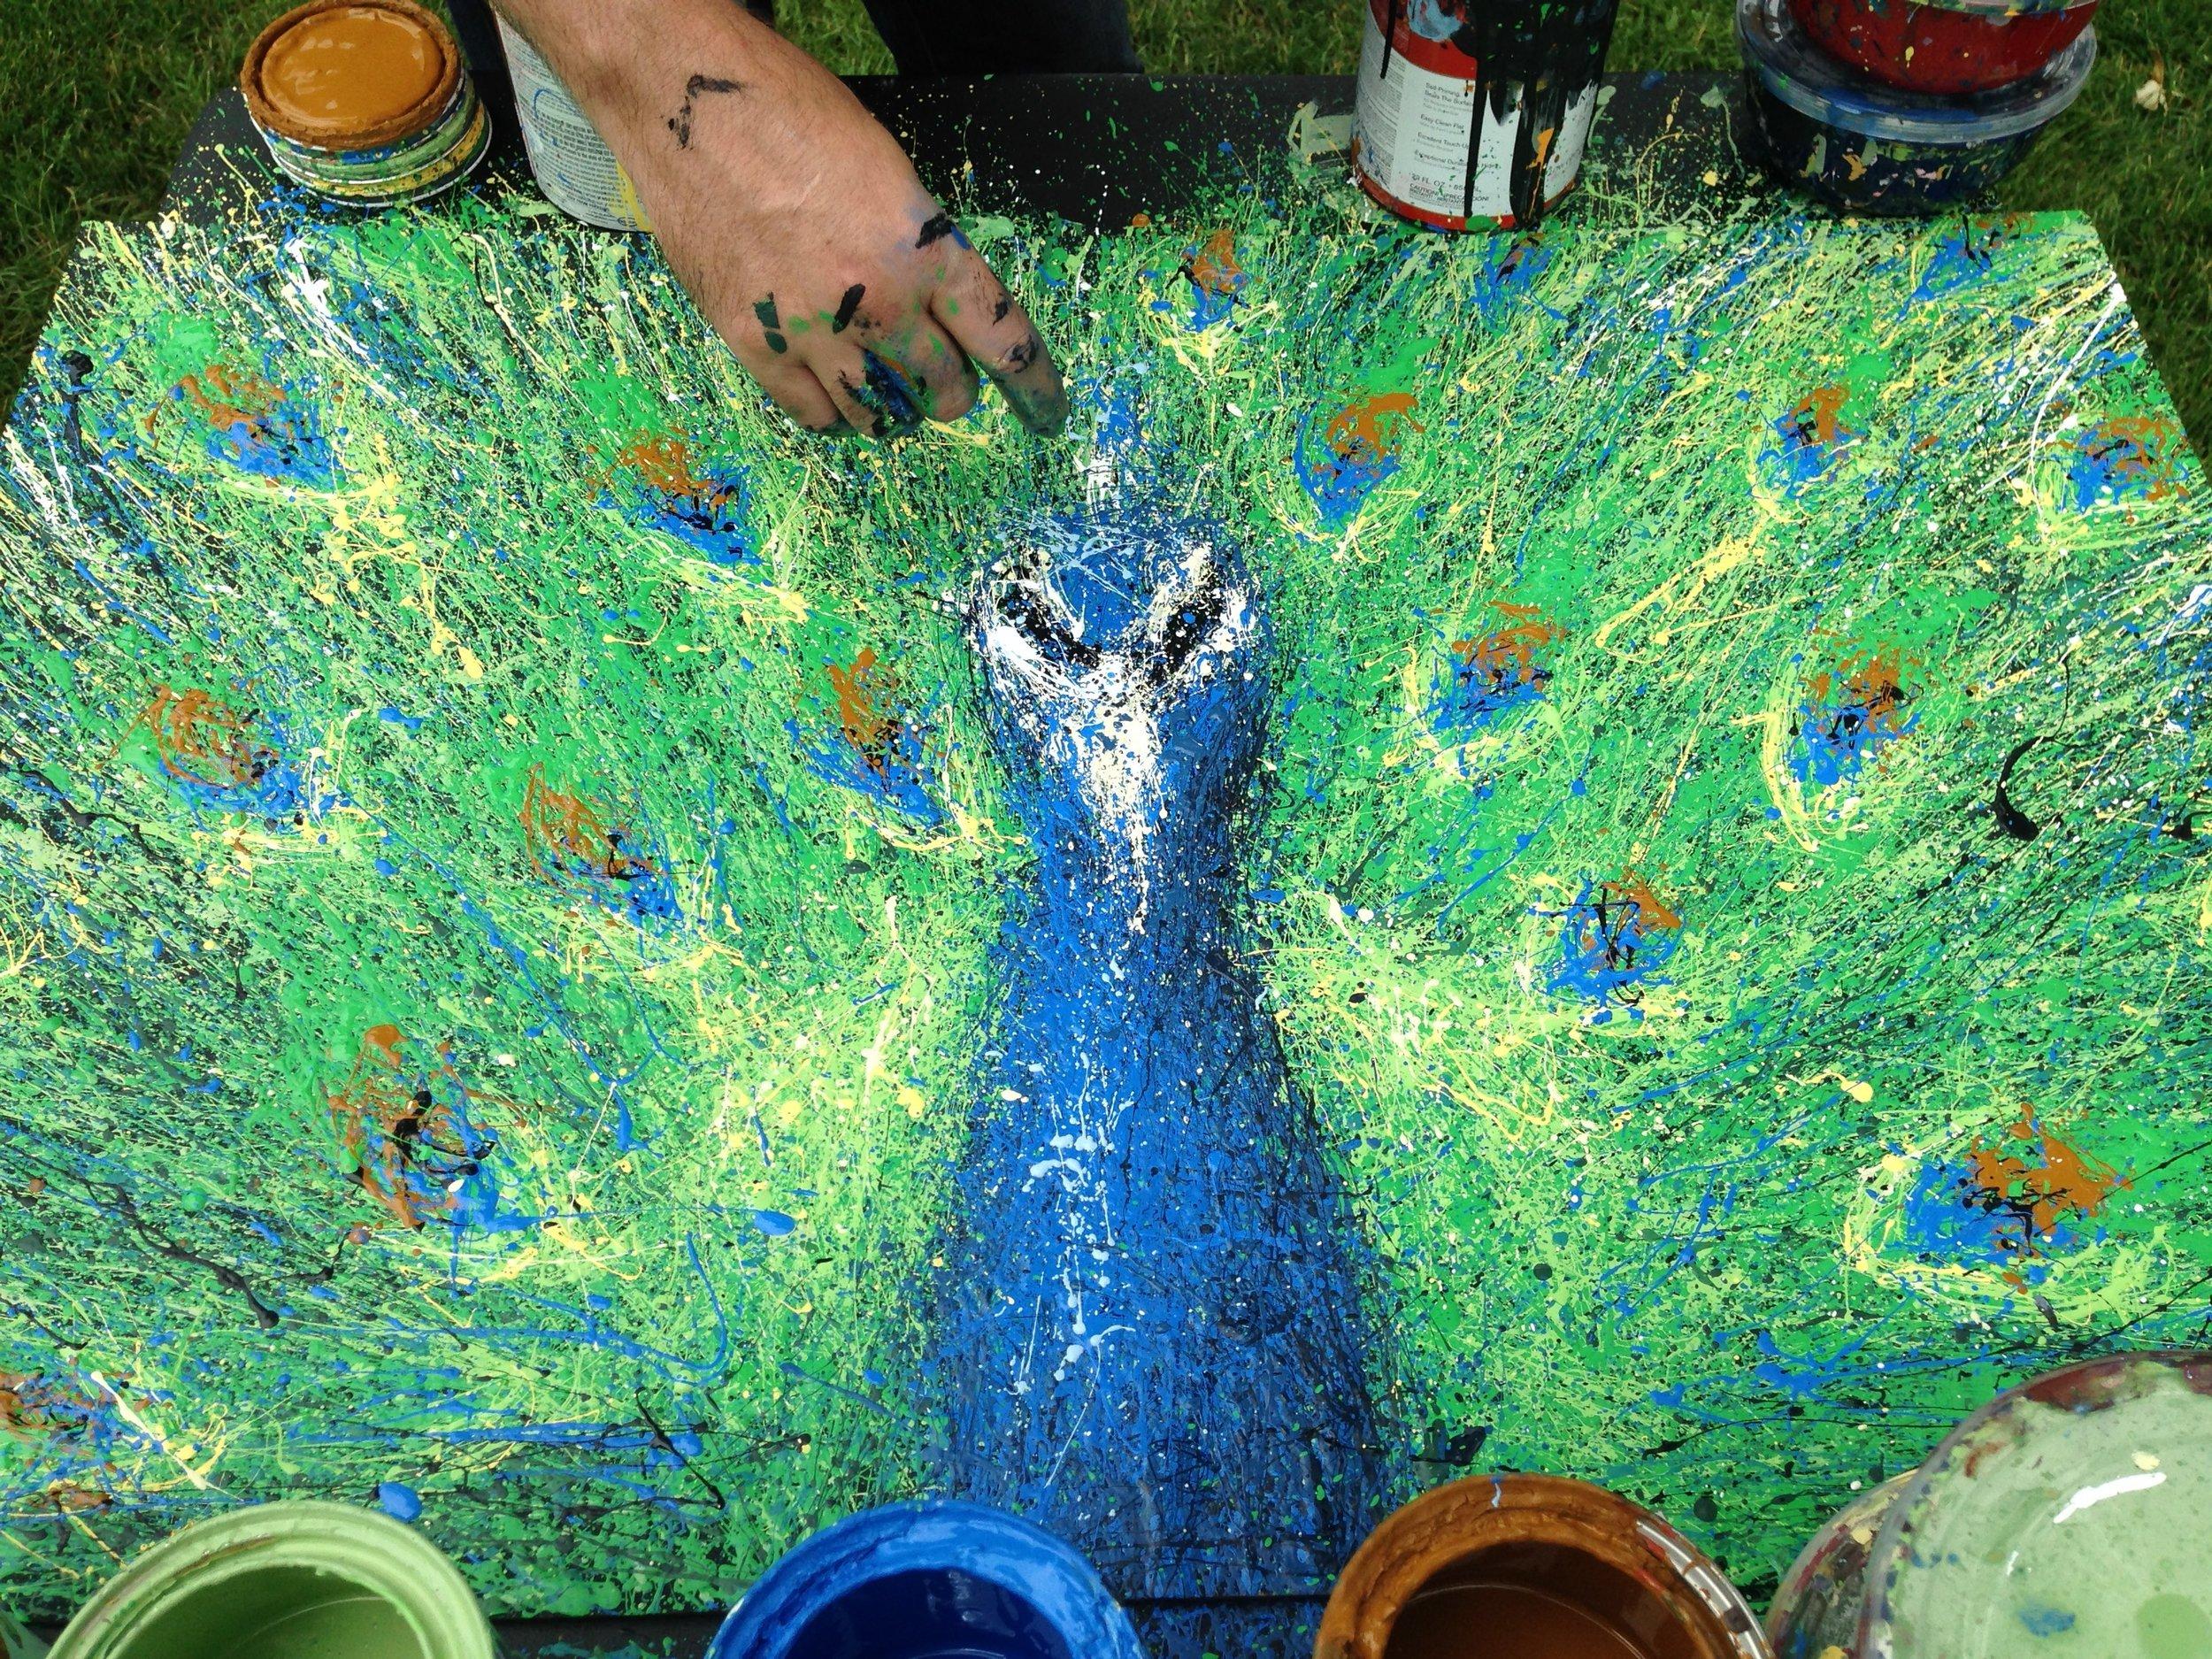 Peacock Demo